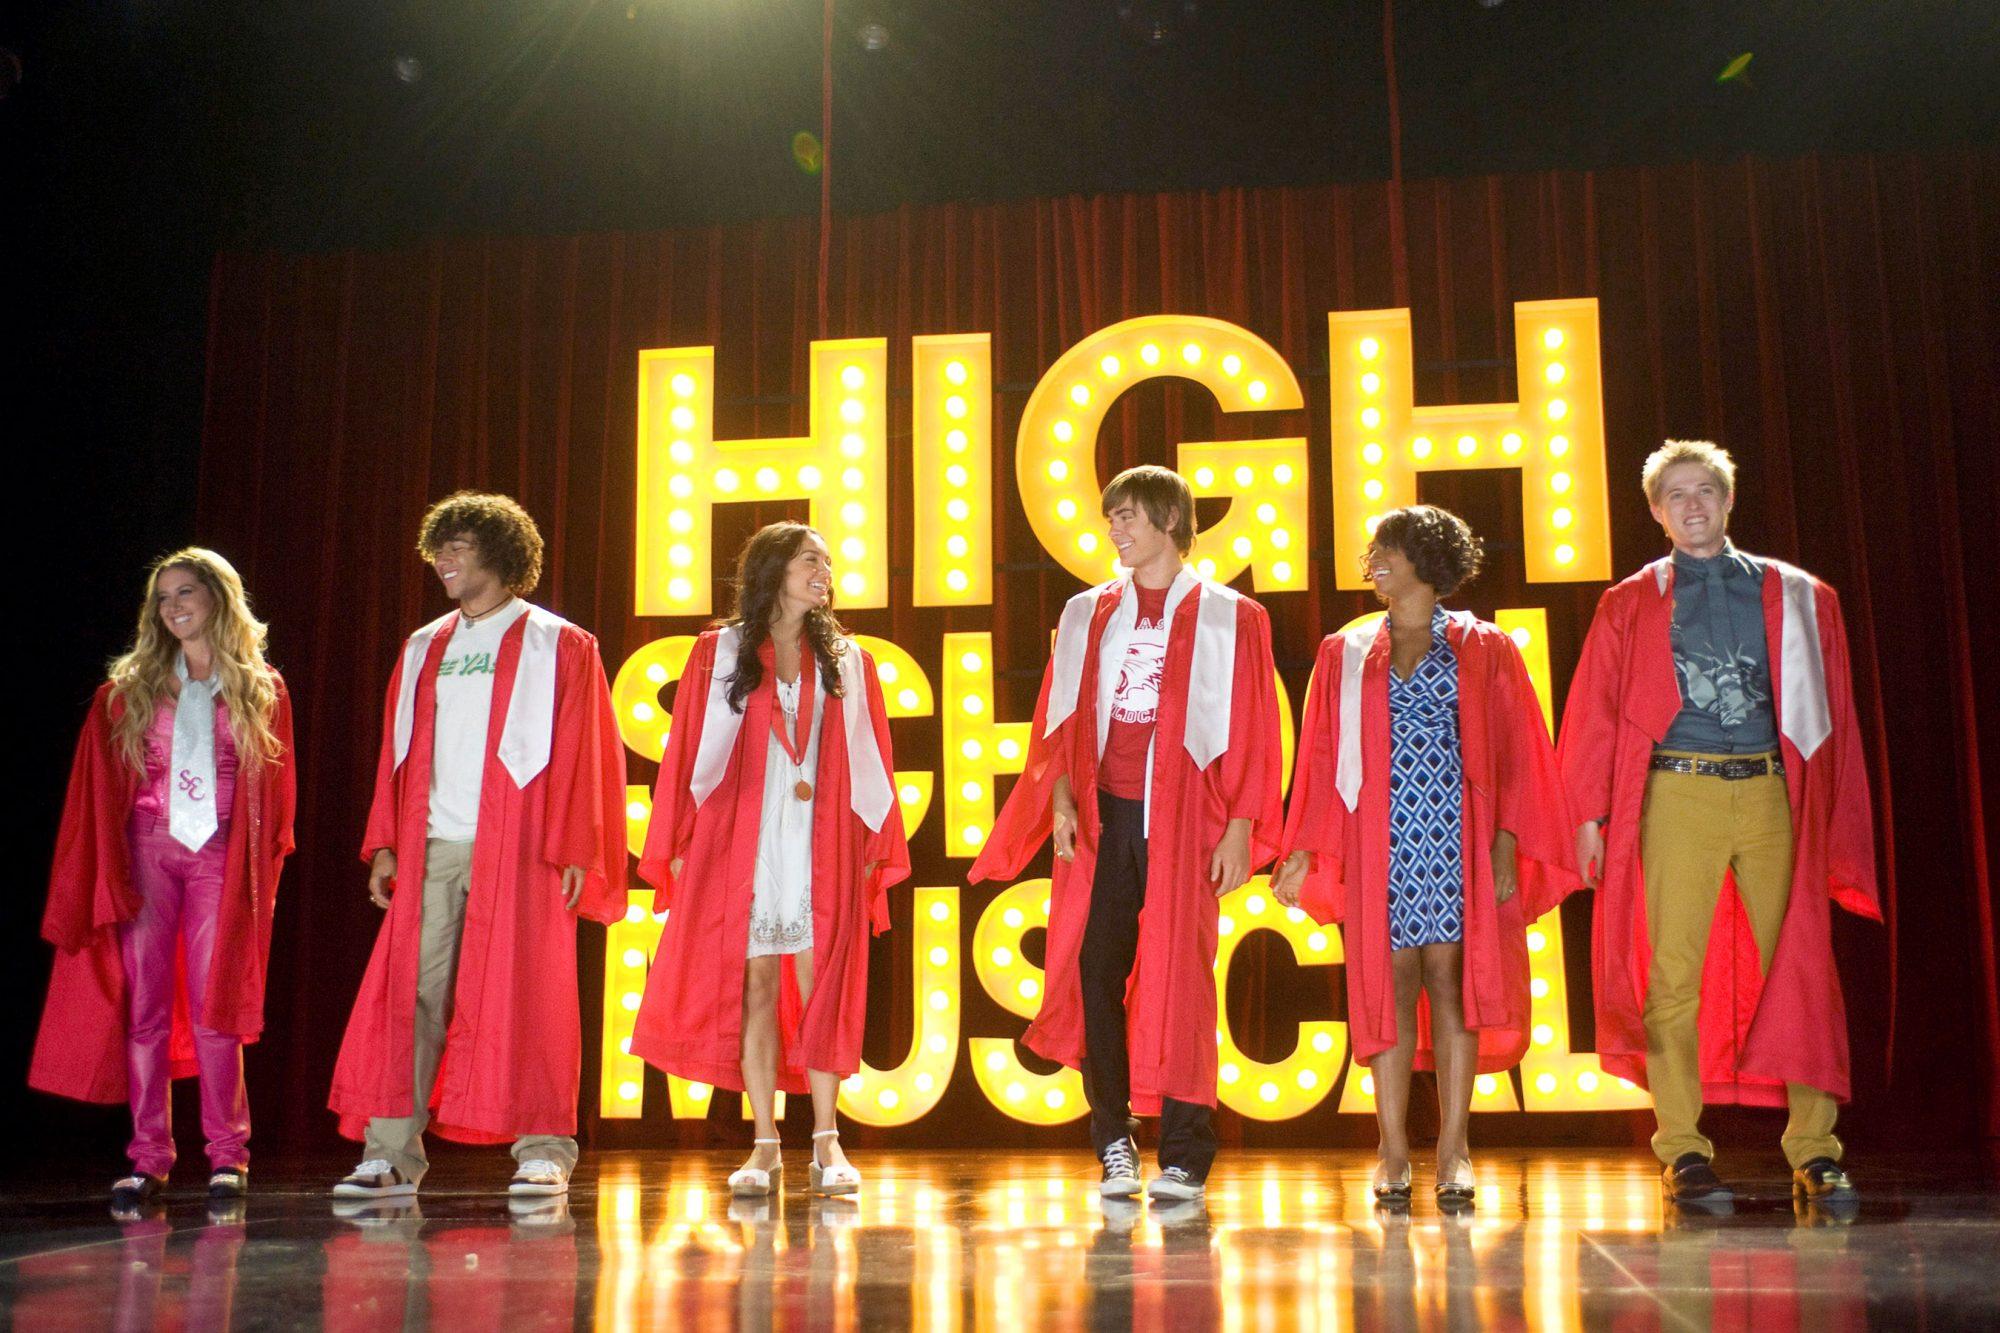 HIGH SCHOOL MUSICAL 3: SENIOR YEAR, from left: Ashley Tisdale, Corbin Bleu, Vanessa Hudgens, Zac Efr